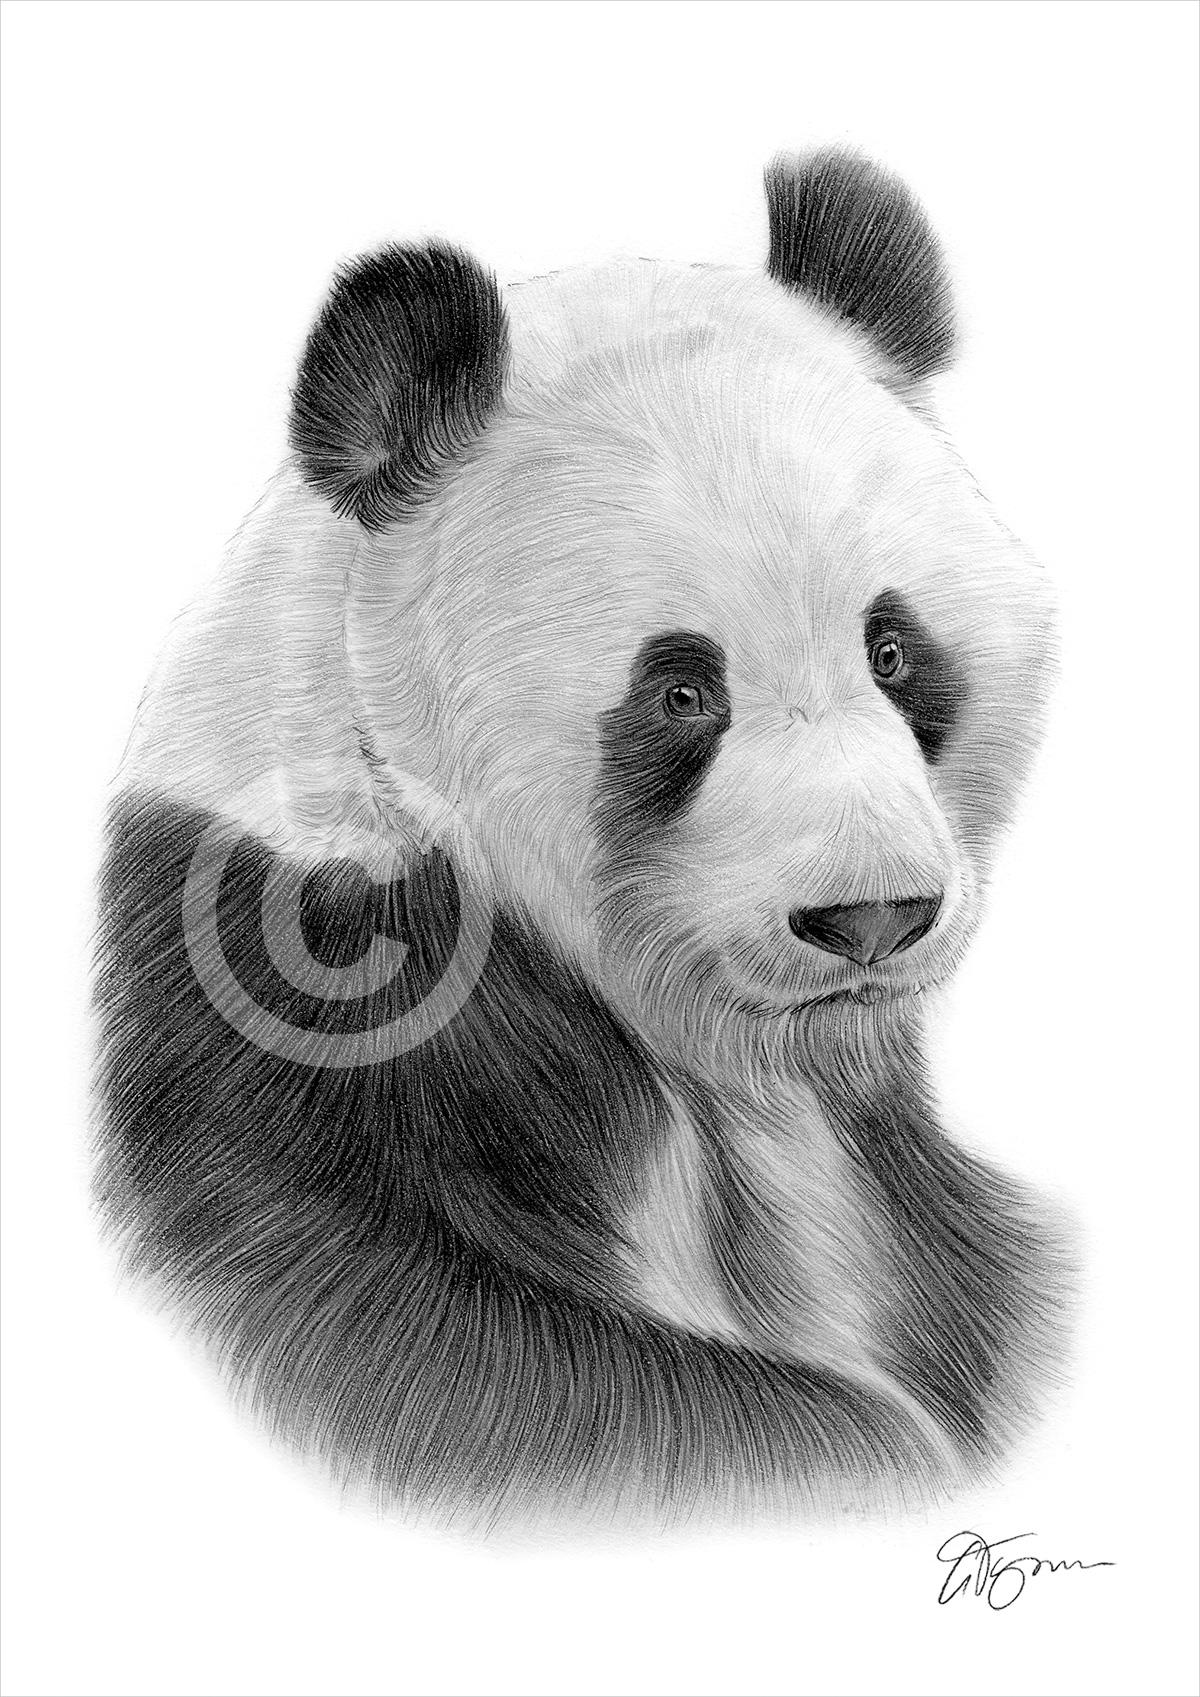 Pencil Drawing Of A Giant Panda By Artist Gary Tymon